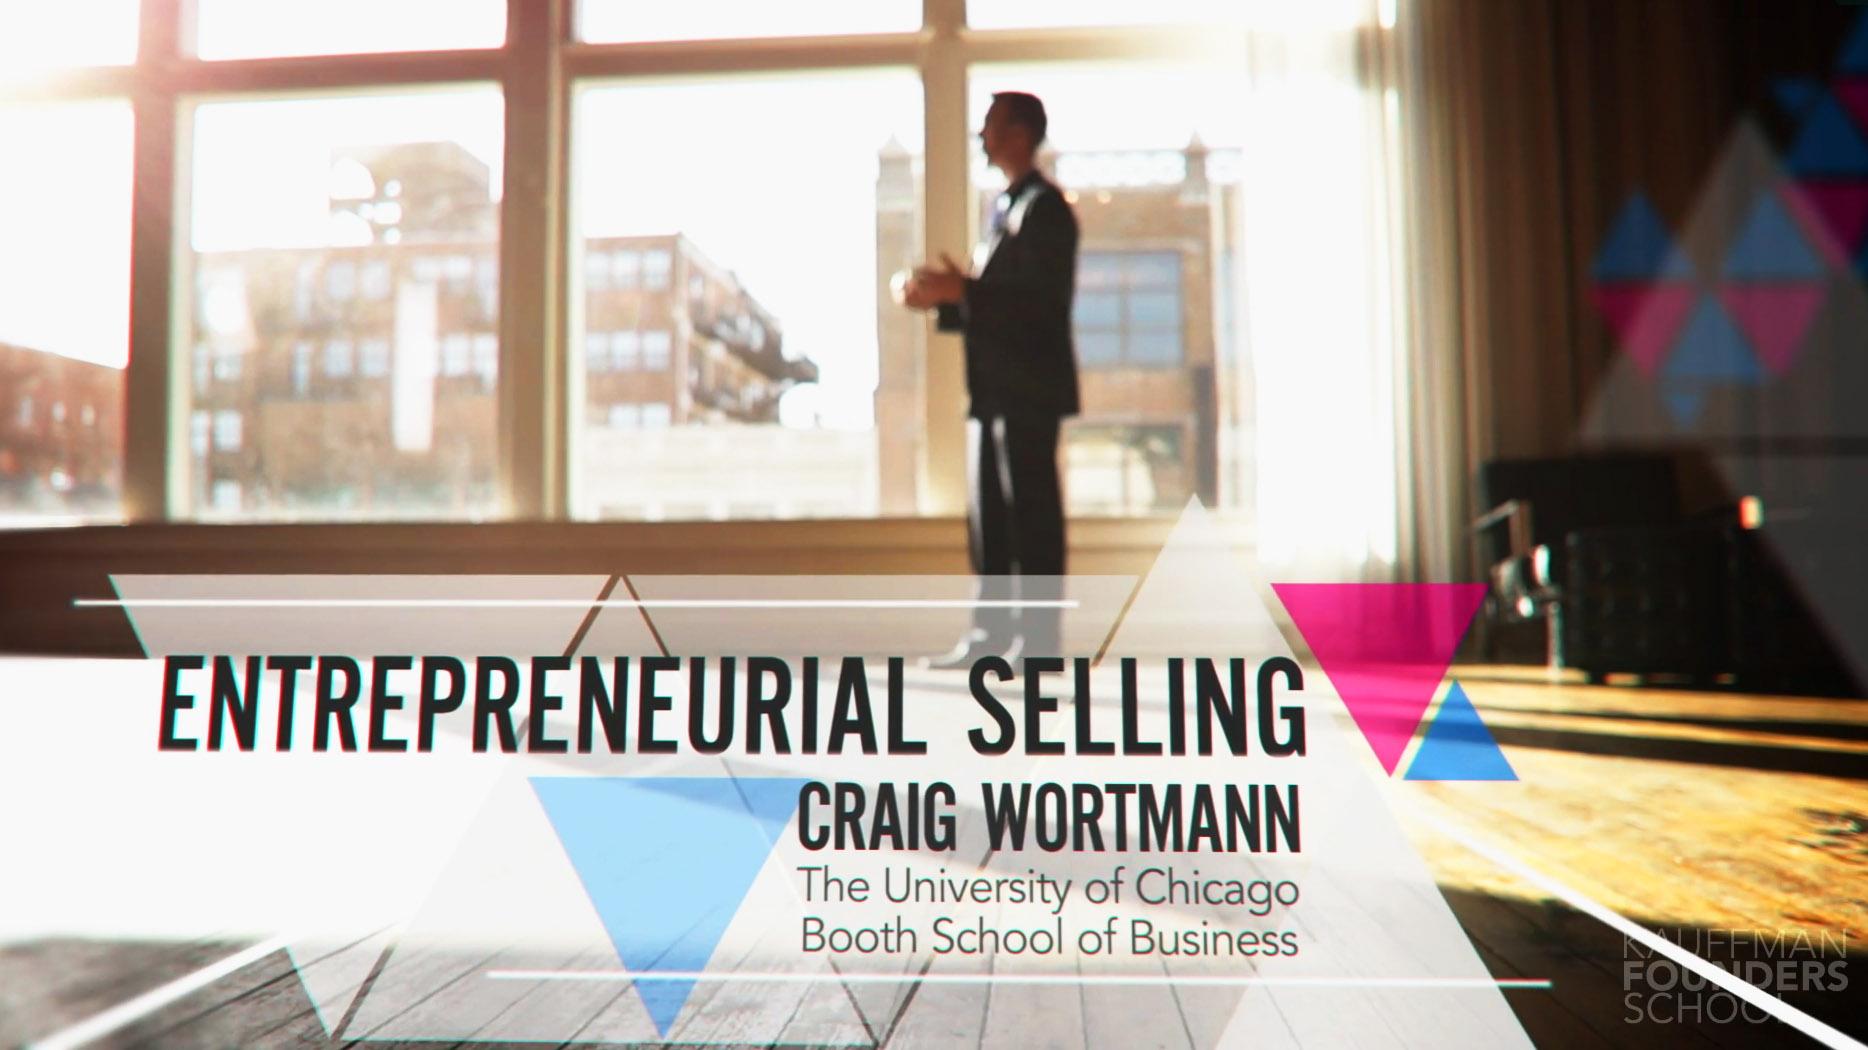 CraigWortmann-VimeoSplash.jpg